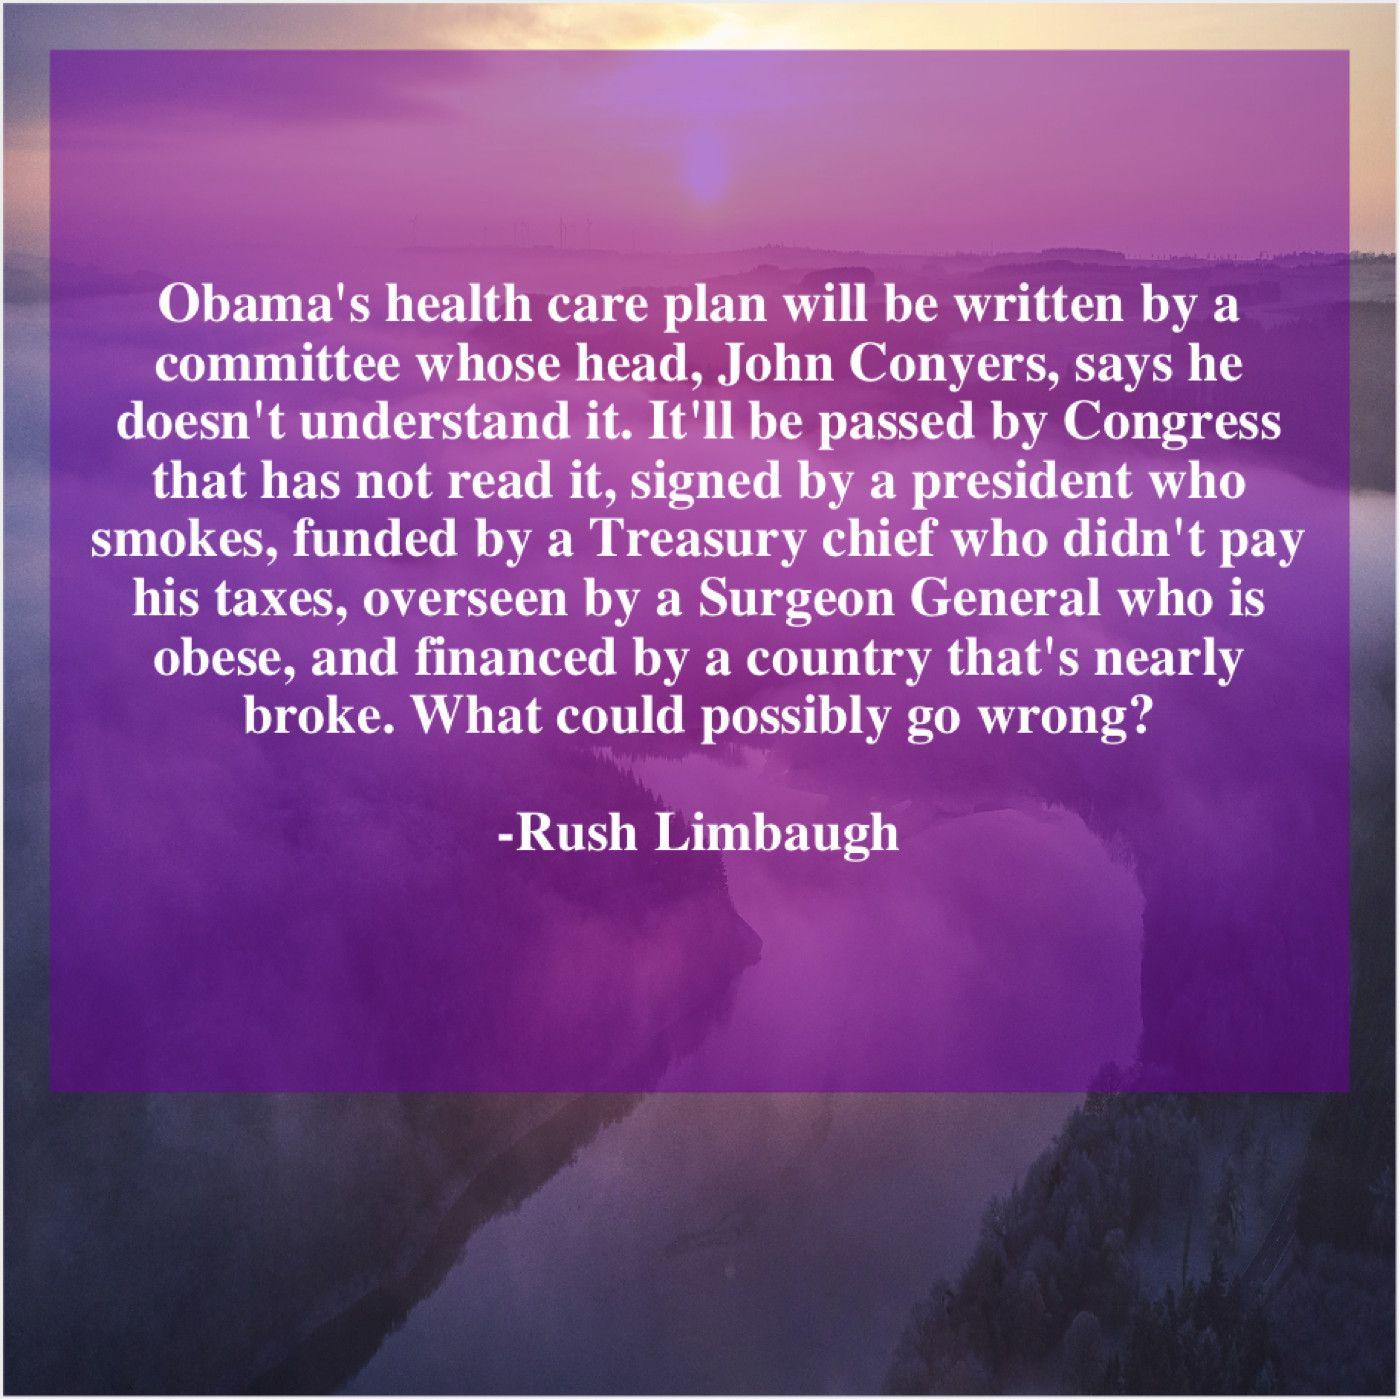 Rush Limbaugh Obamas health care plan will Care plans